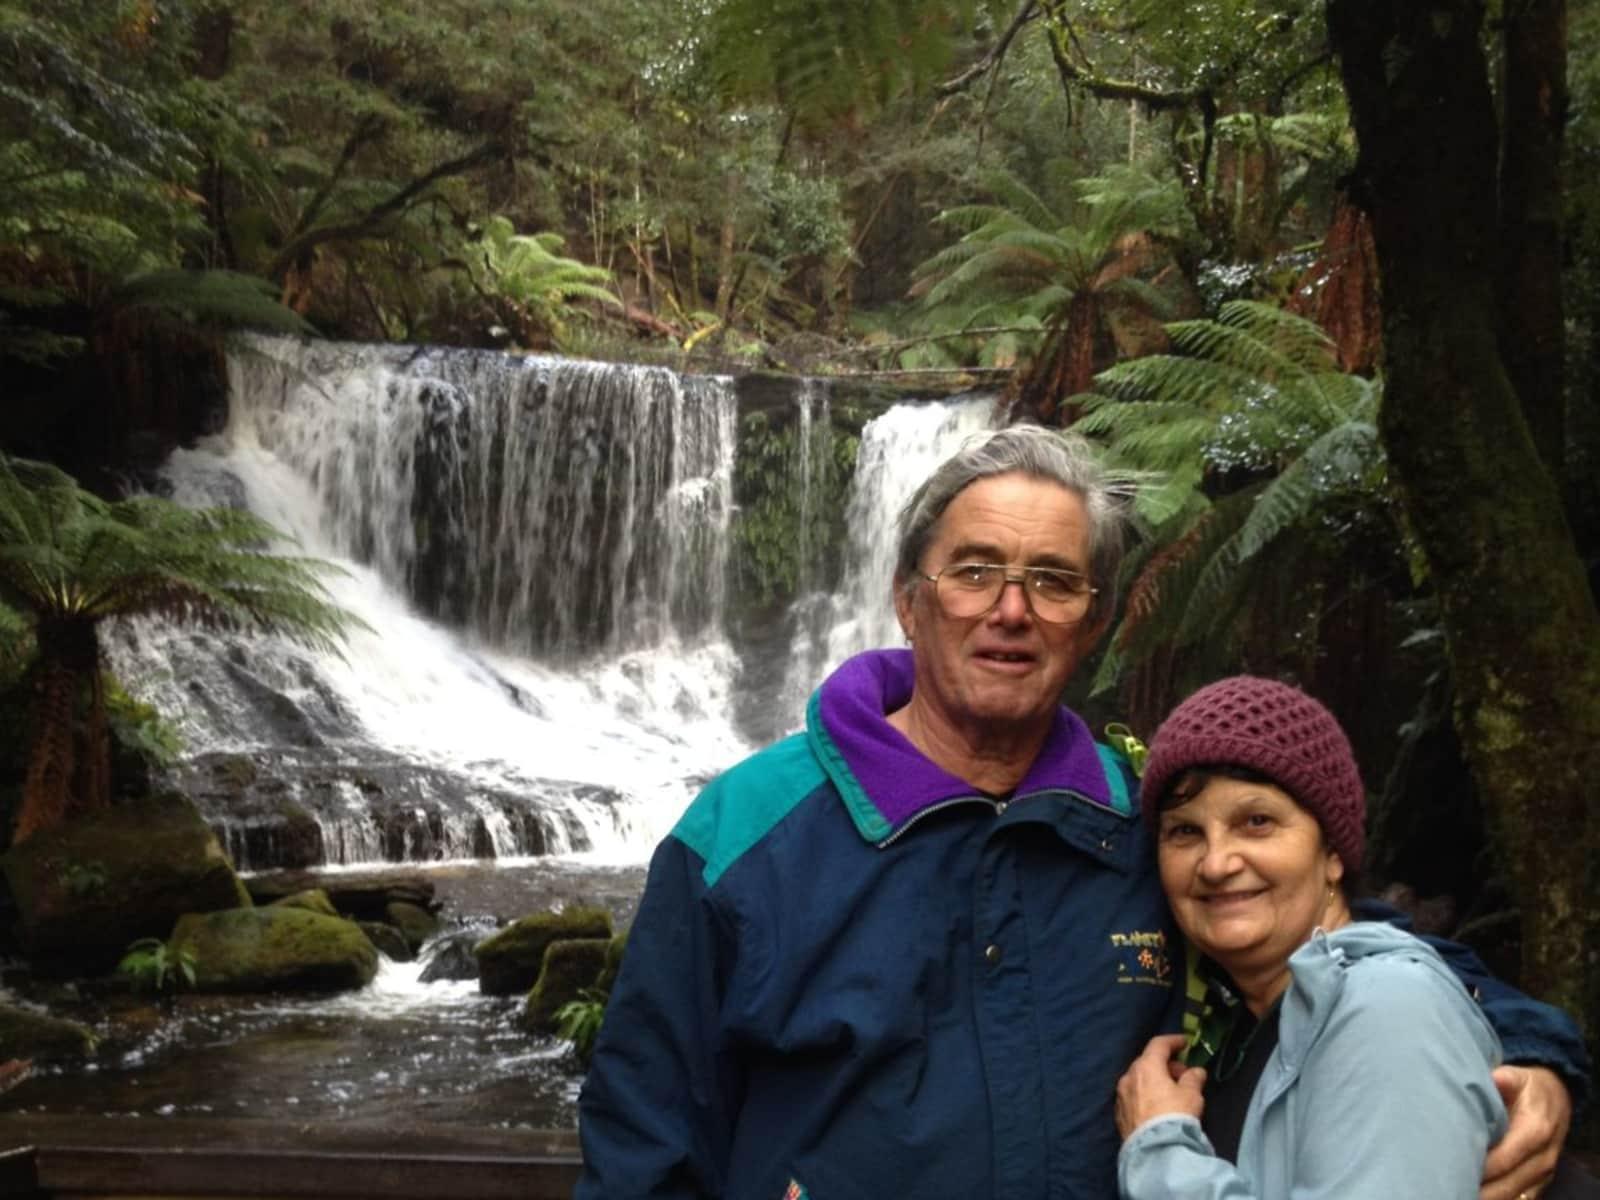 Peter & Elizabeth from Brisbane, Queensland, Australia